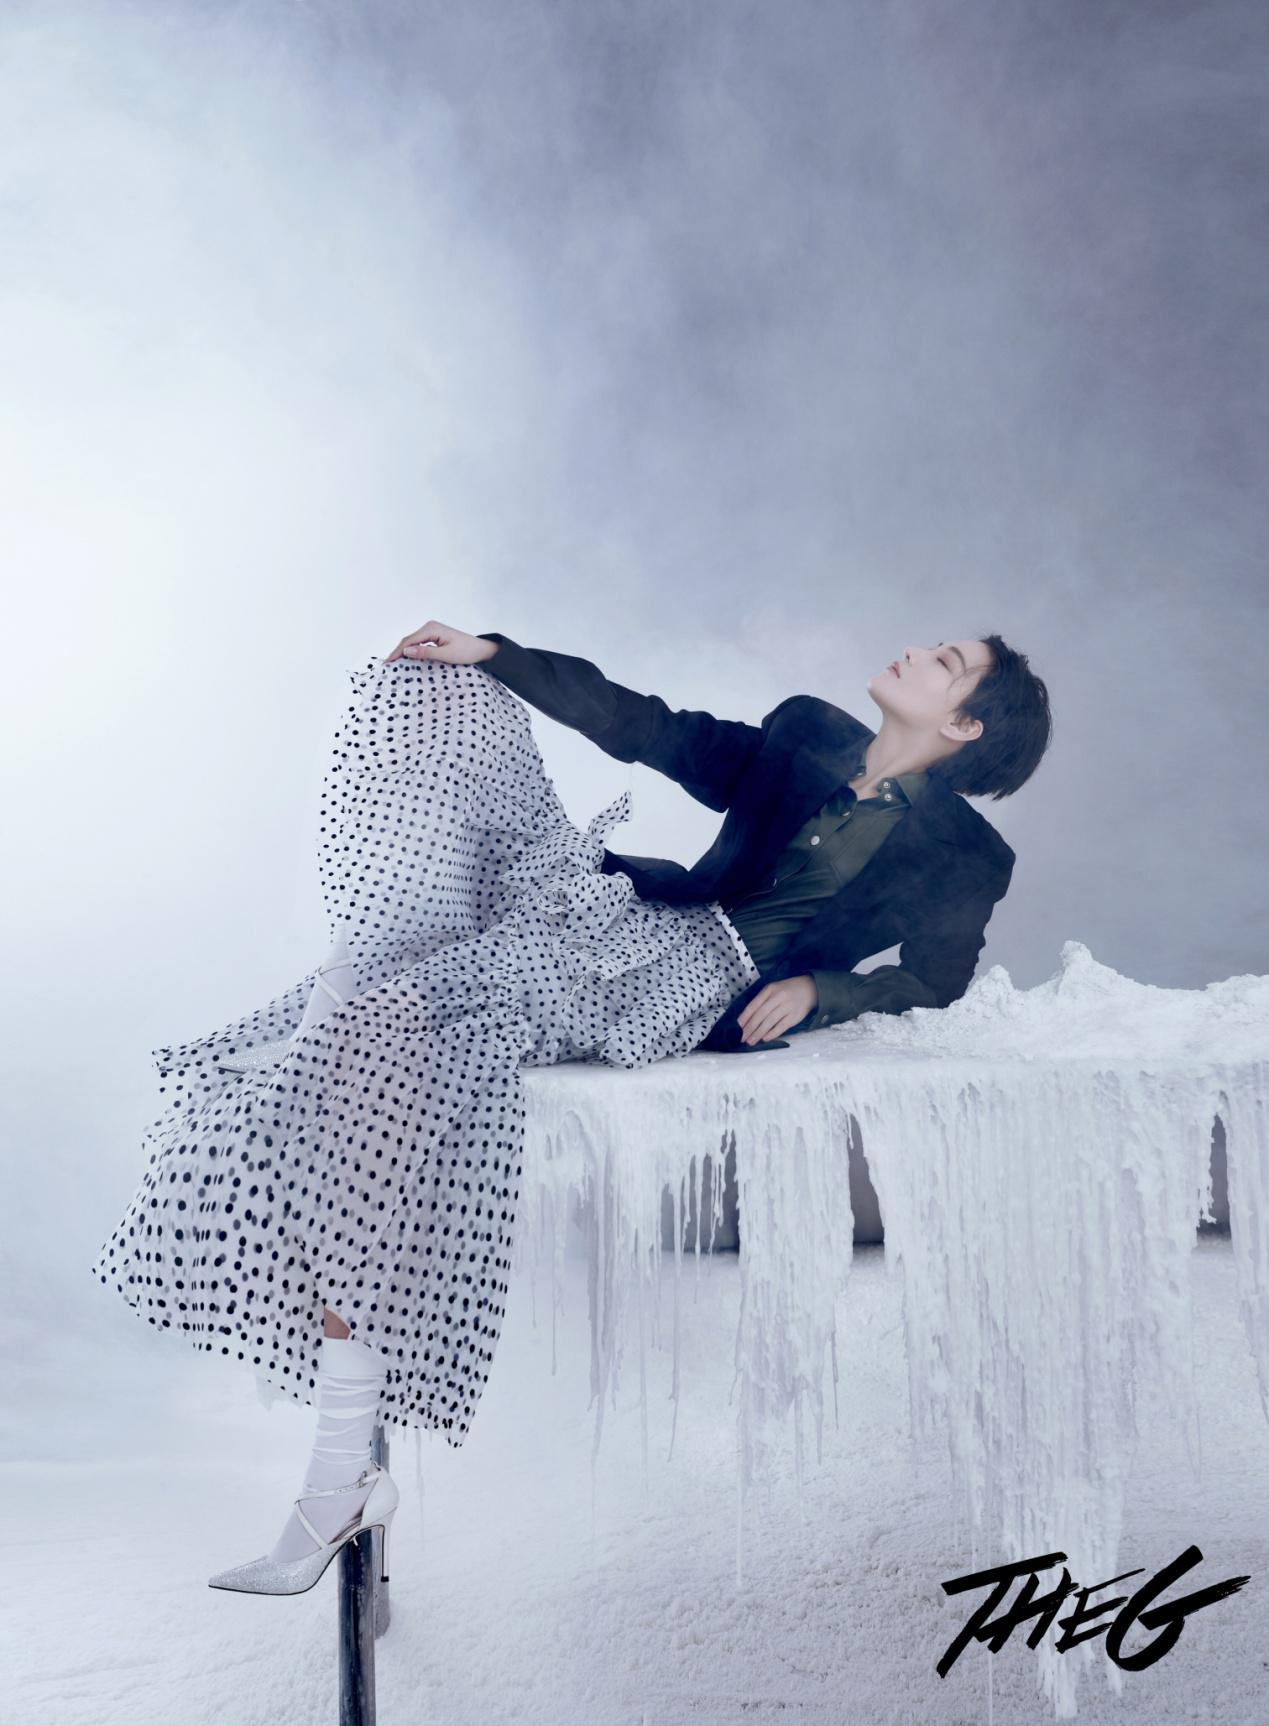 LuxuryRebel鞋子亮相張馨予時尚大片盡顯冰雪女王范兒